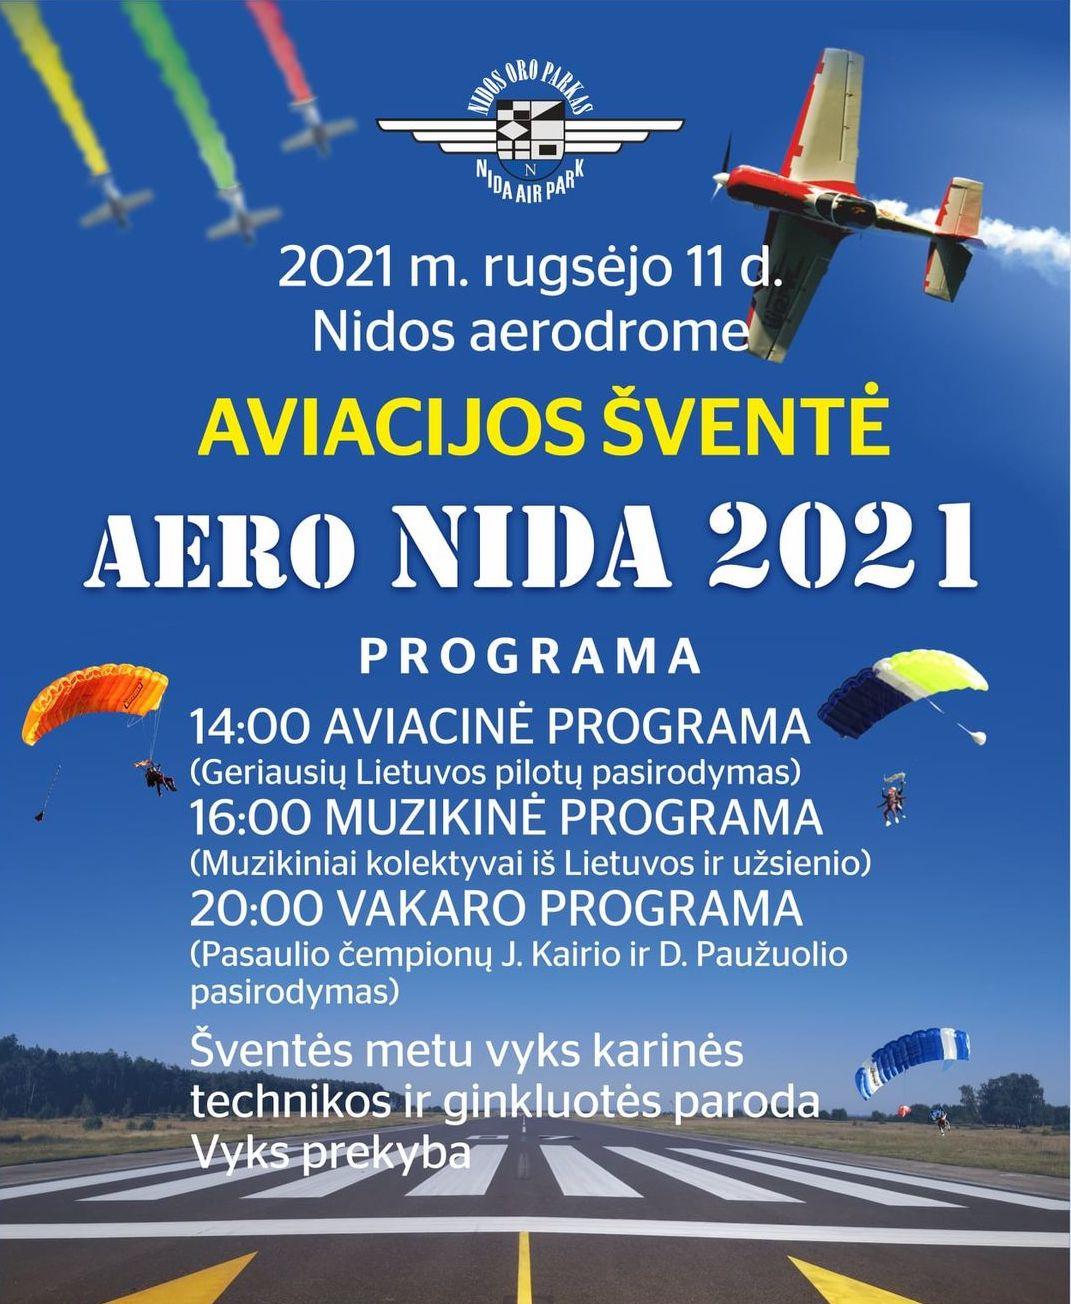 nida aero 2021